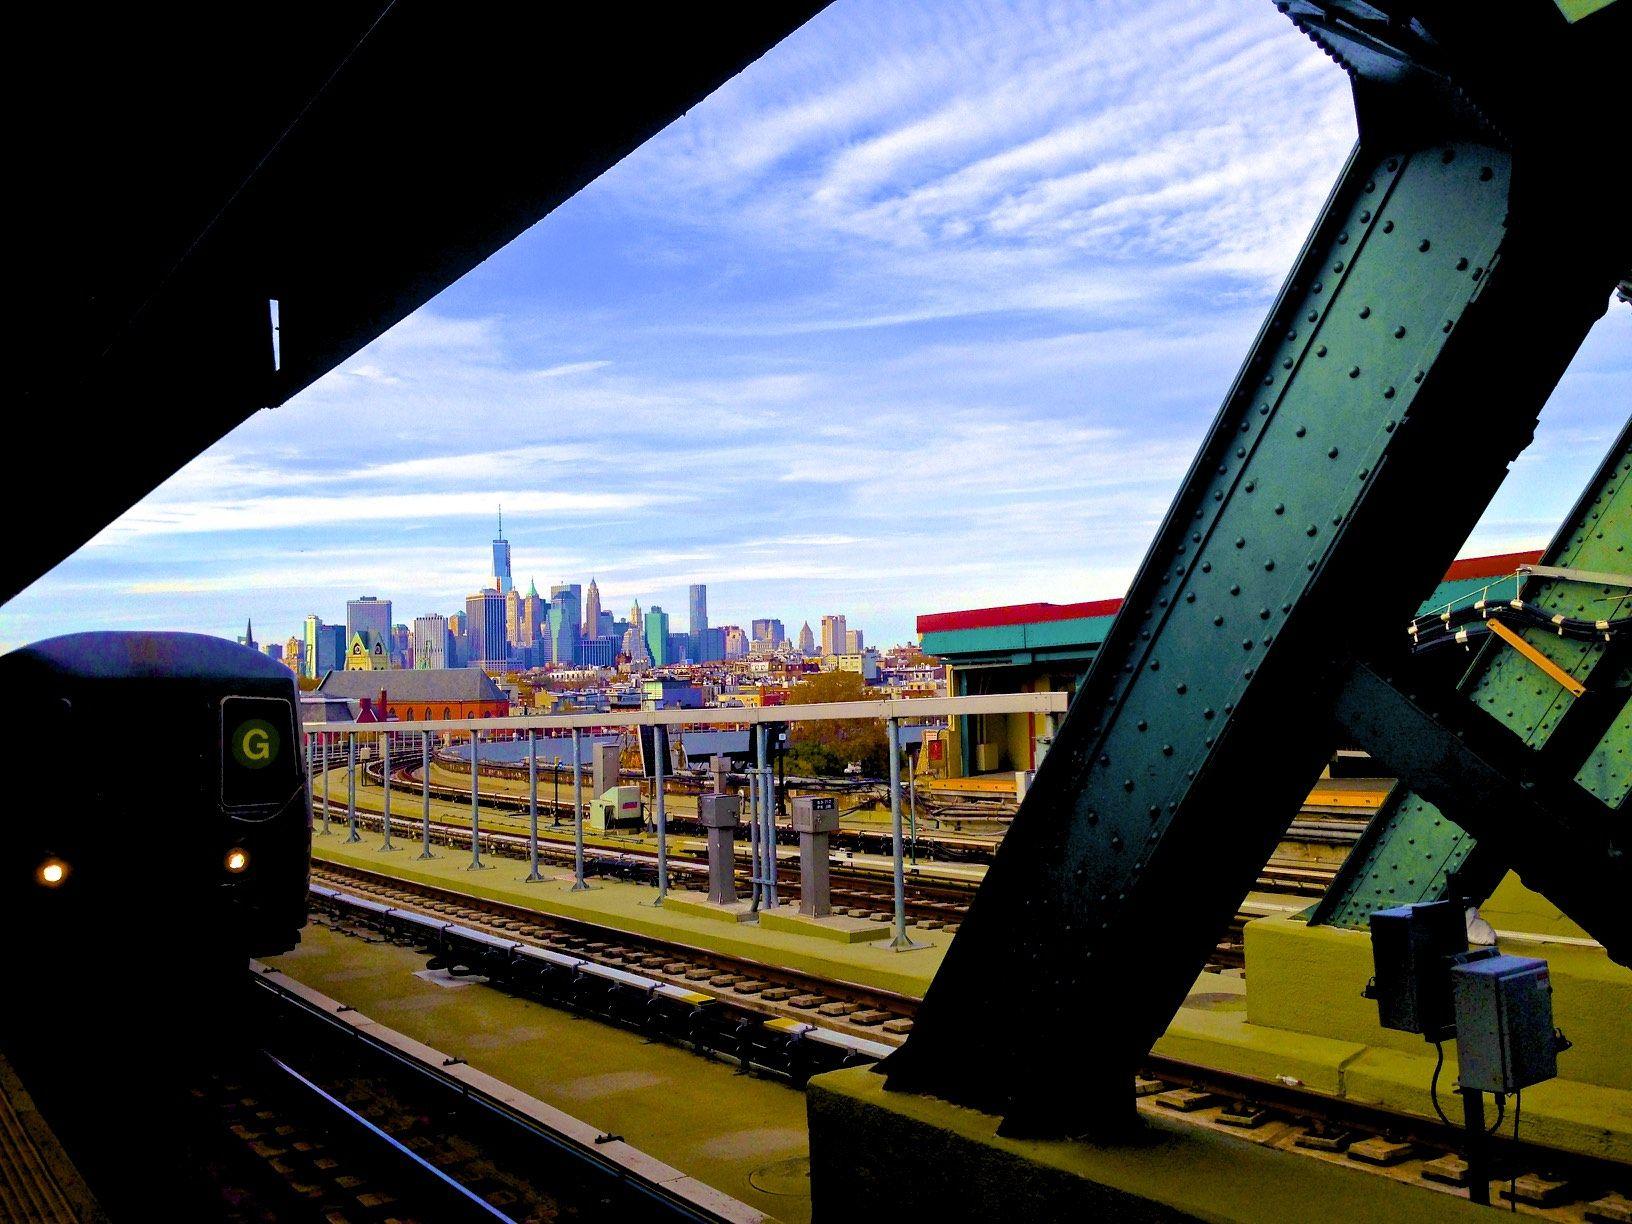 New York City, USA. G train @eduardoxavierph